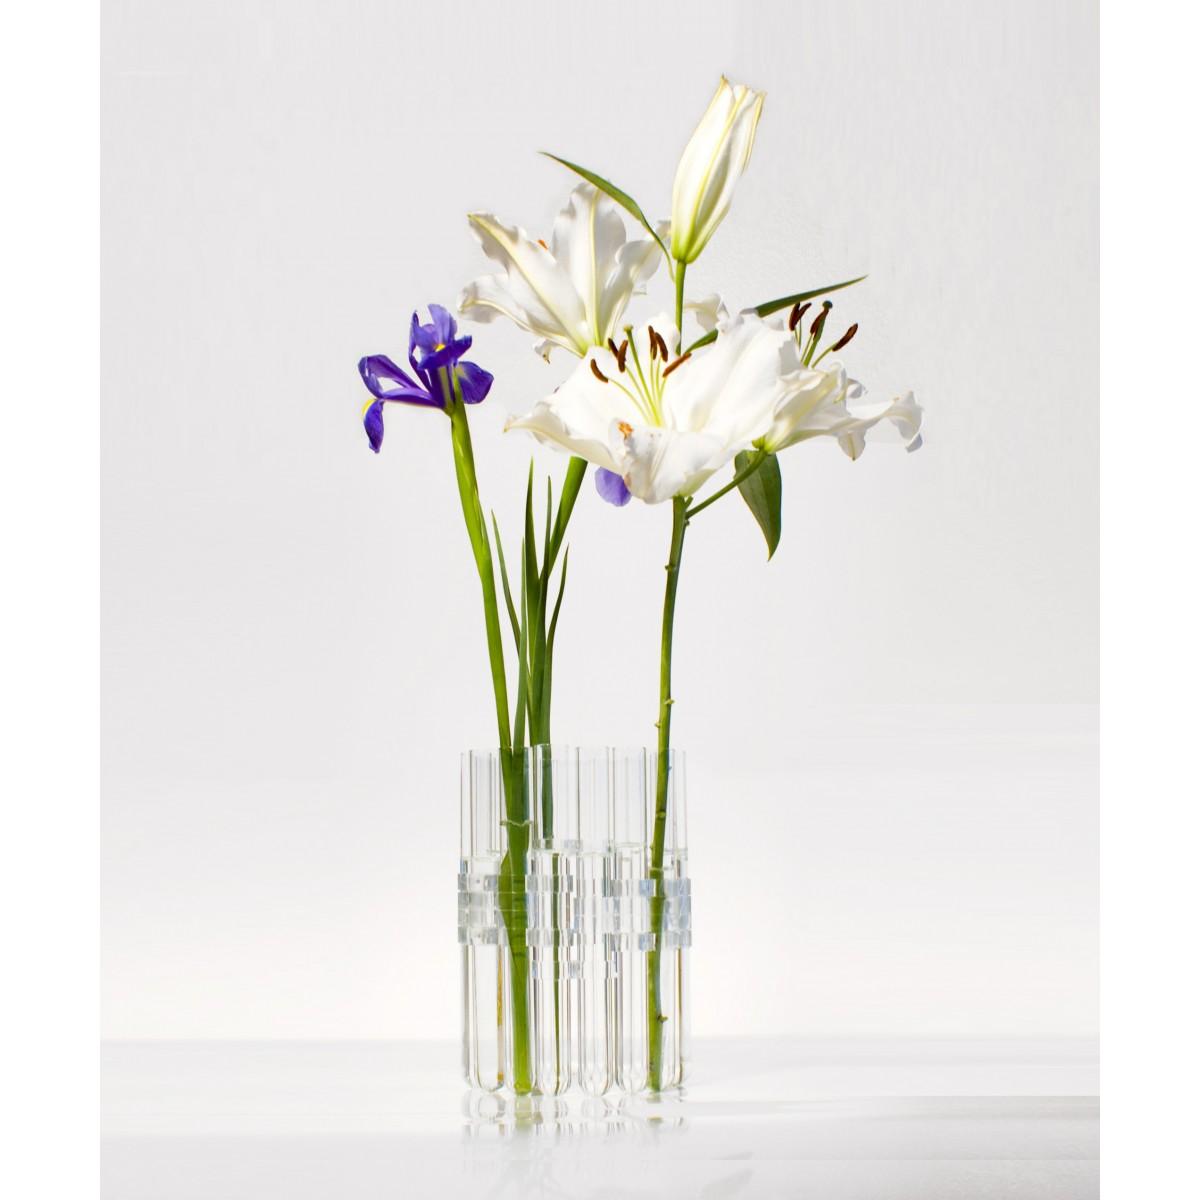 Terrific-Tubes - Vase Wally